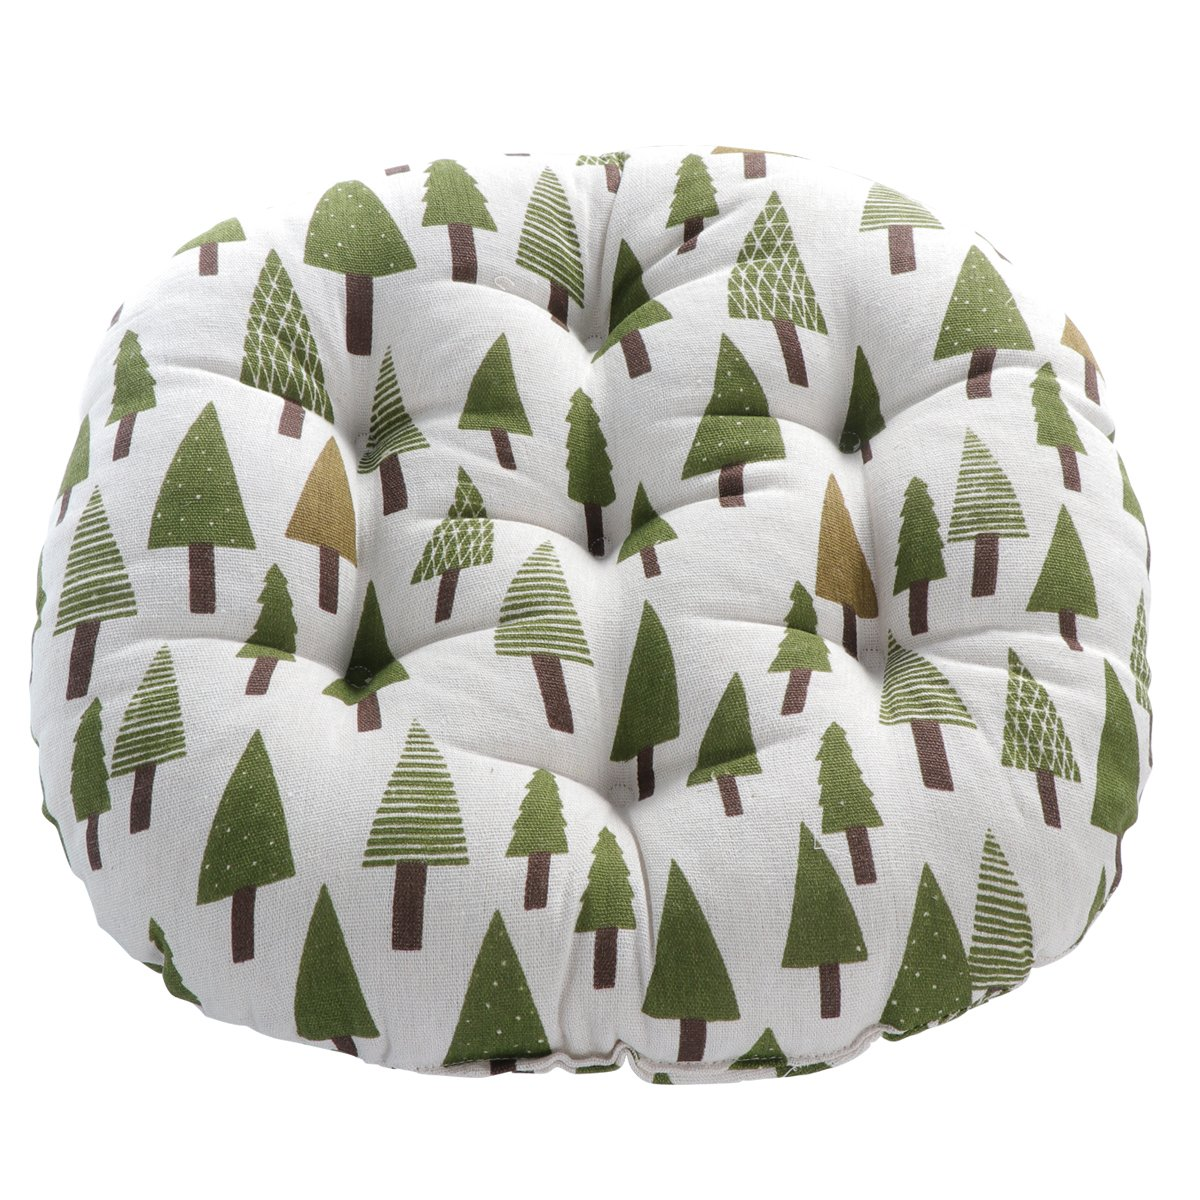 WINOMO Round Floor Pillow Cushion Cotton Linen Pouf Seat Cushion Yoga Window Tatami Home Office Pad (Trees Pattern) by WINOMO